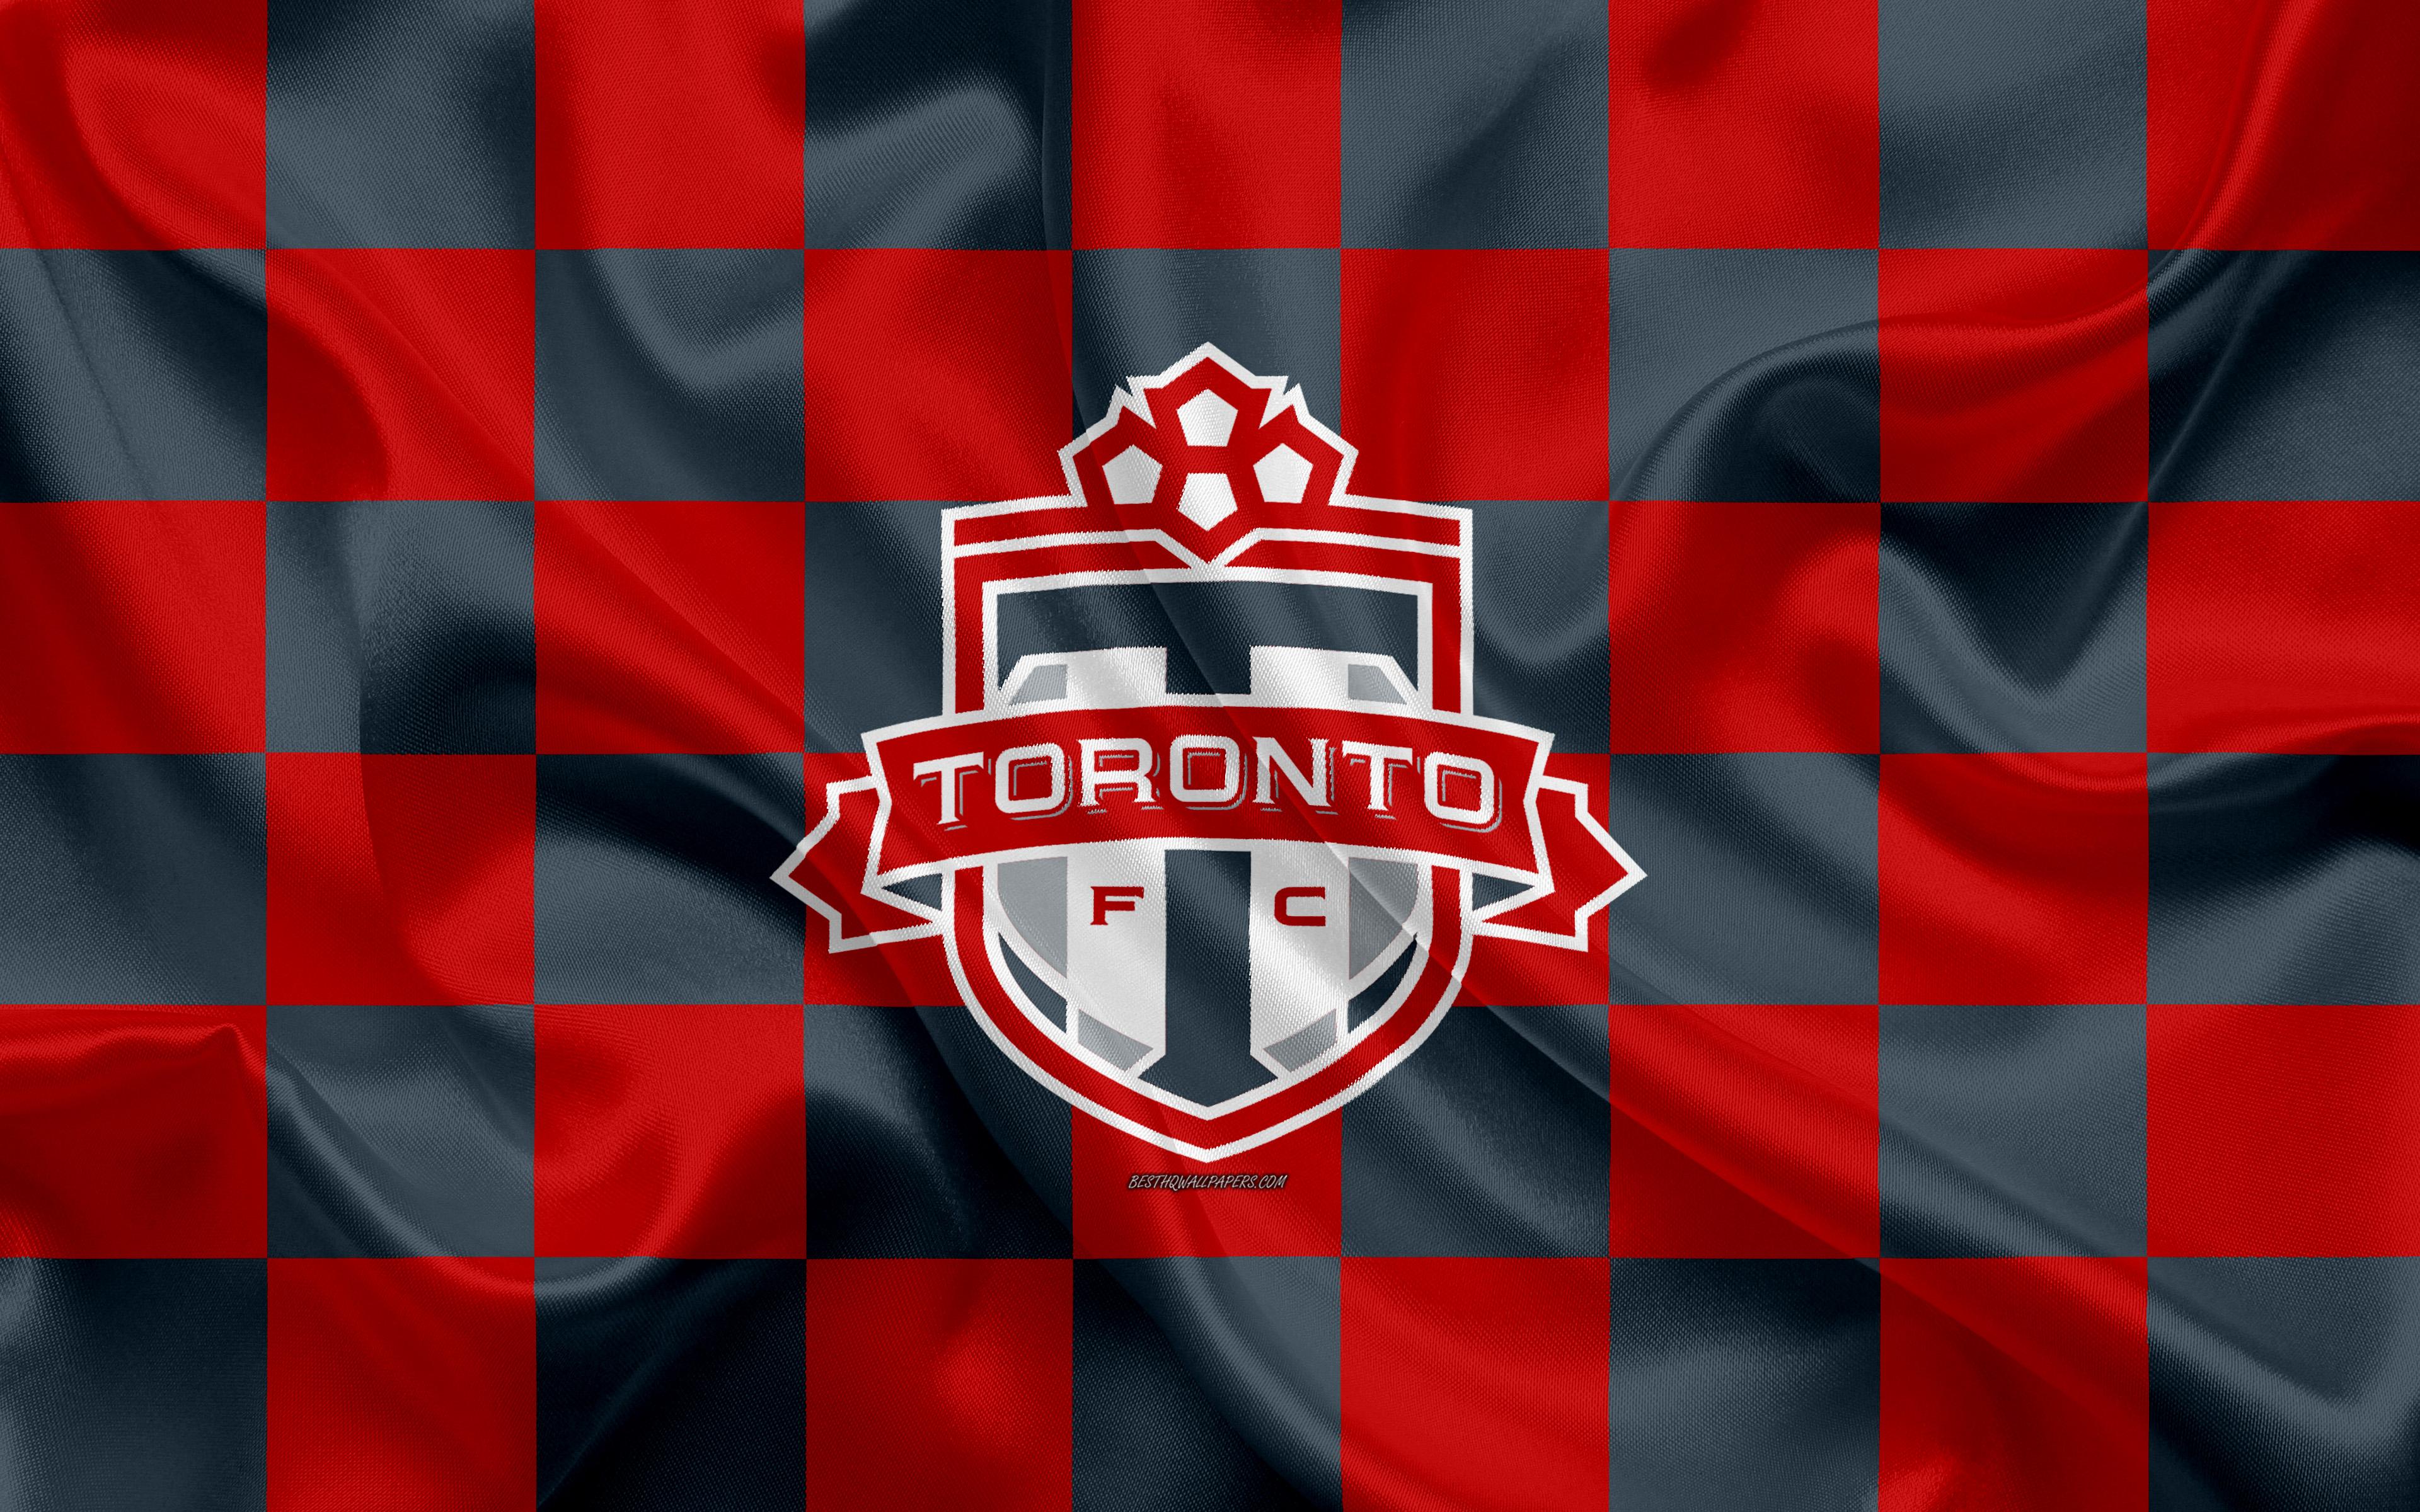 Download wallpapers Toronto FC 4k logo creative art red gray 3840x2400